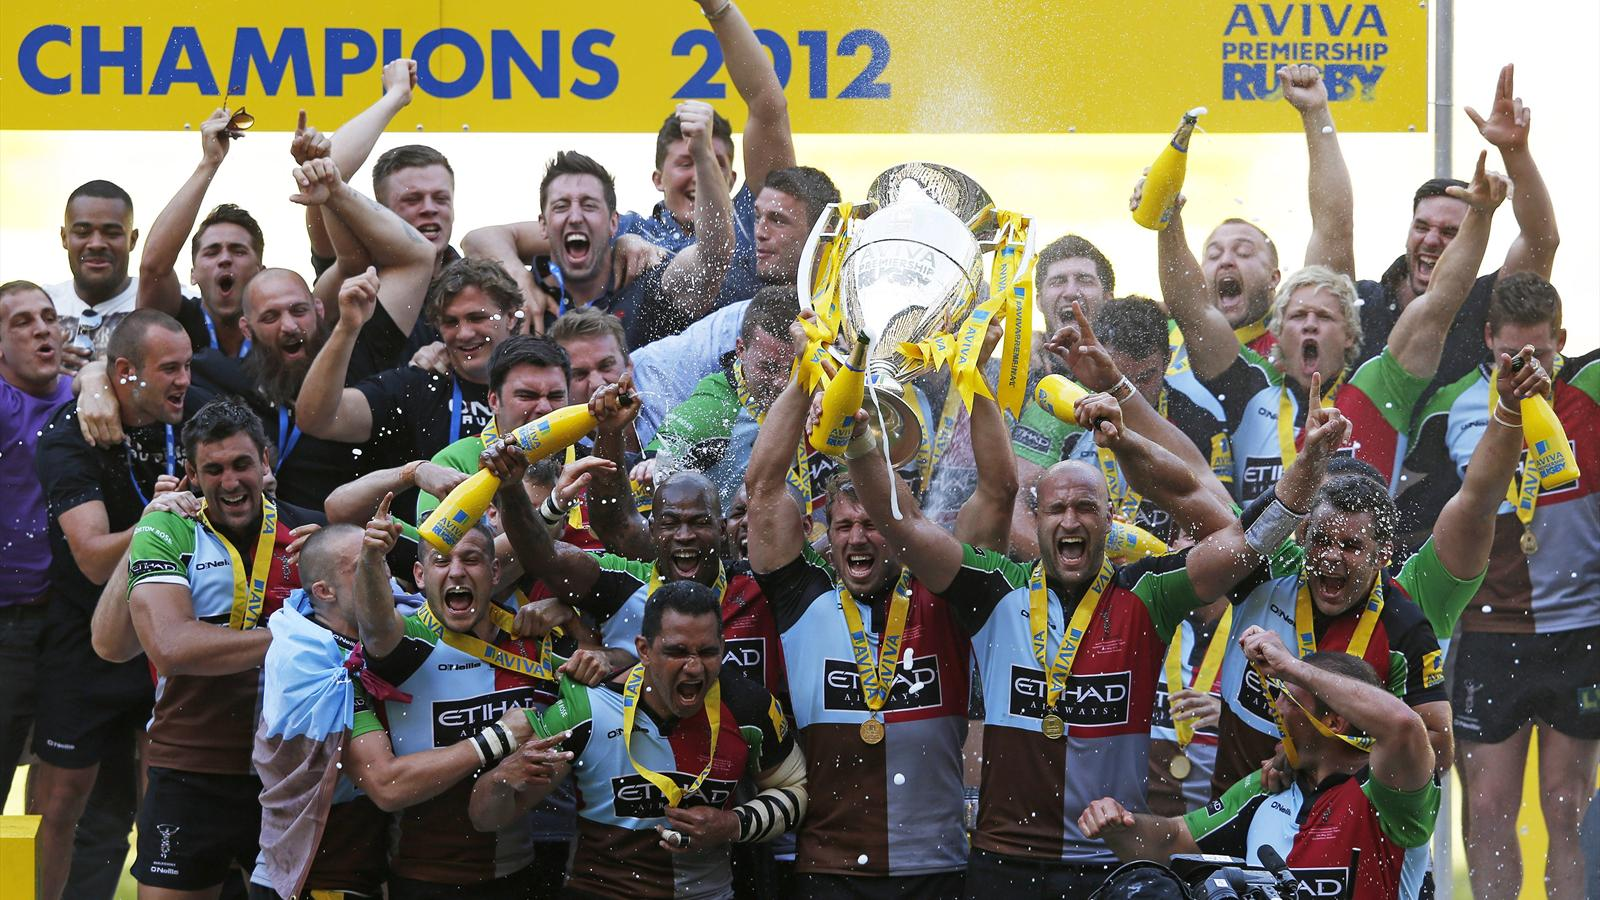 harlequins win first title aviva premiership 2010 2011 rugby eurosport asia. Black Bedroom Furniture Sets. Home Design Ideas